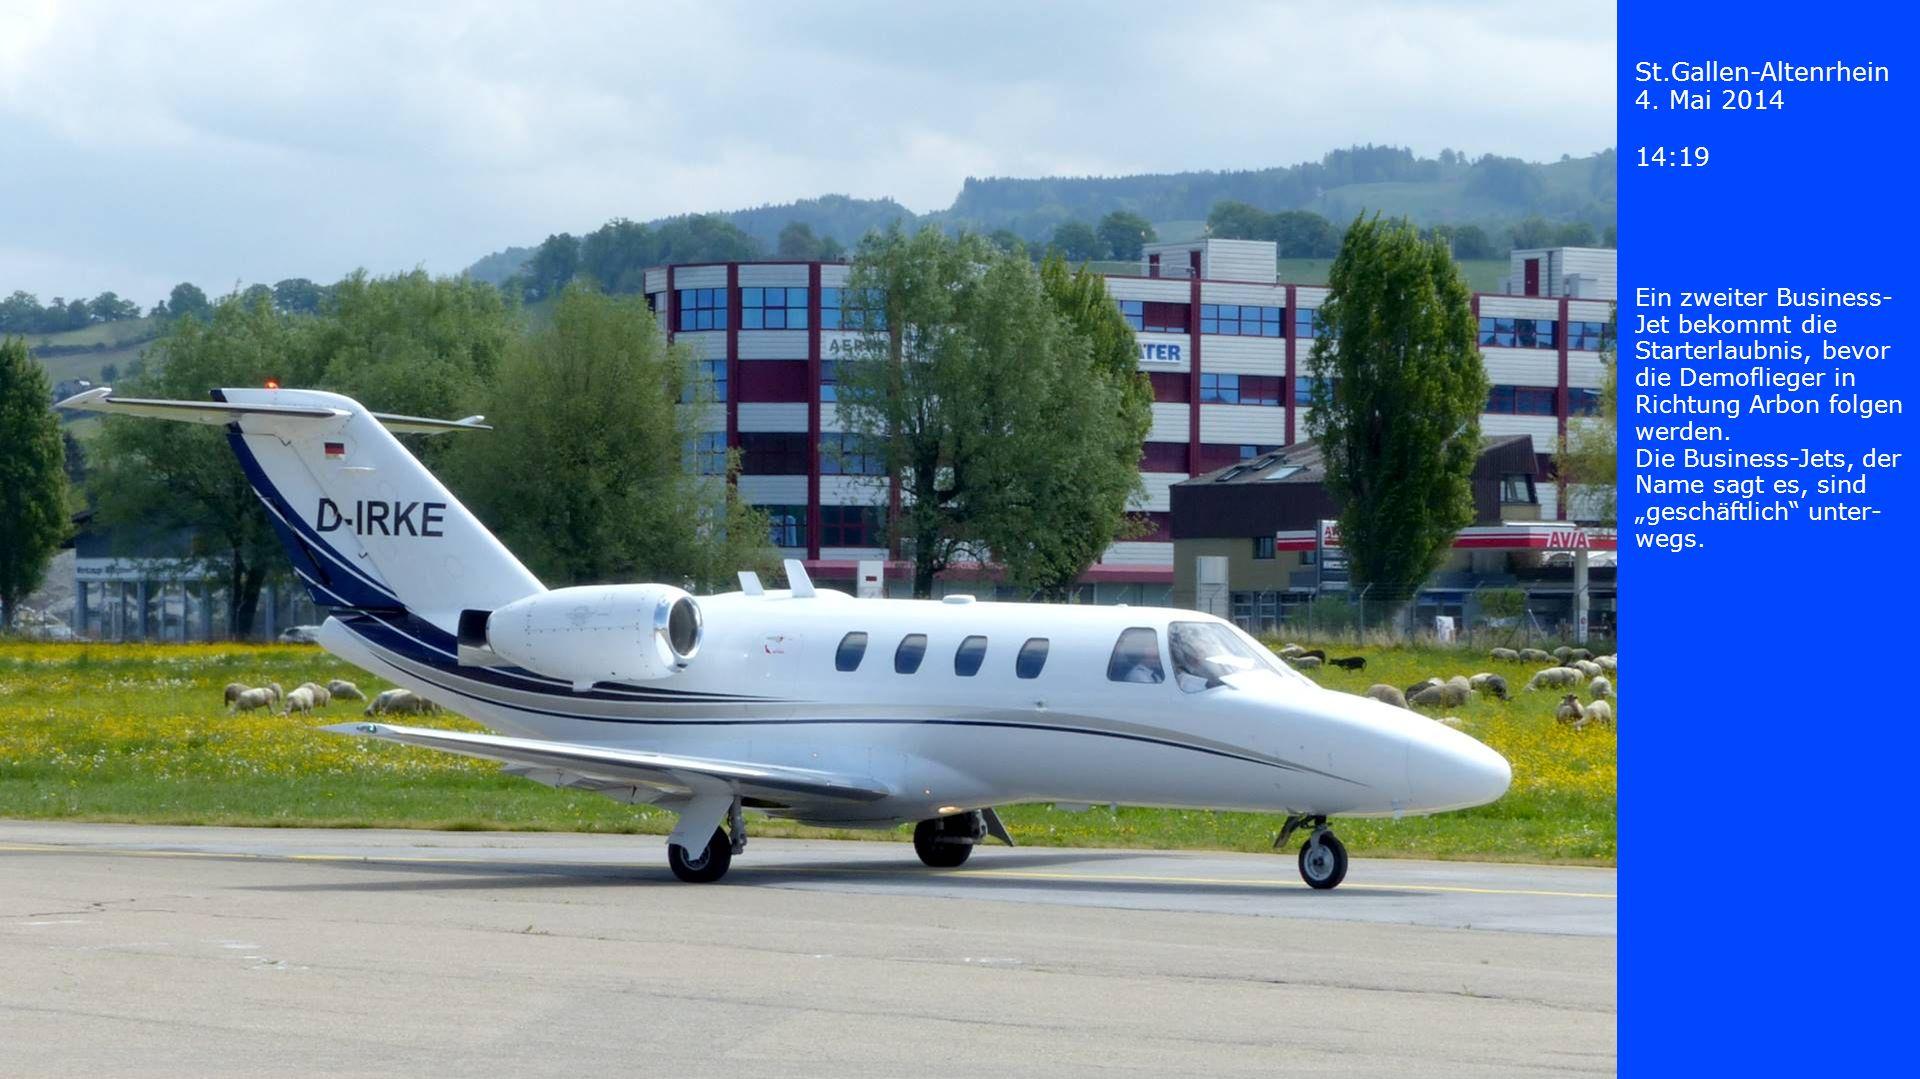 St.Gallen-Altenrhein 4. Mai 2014 14:19 Cessna 525 CitationJet am Pistenende 10 bereit zum Start.